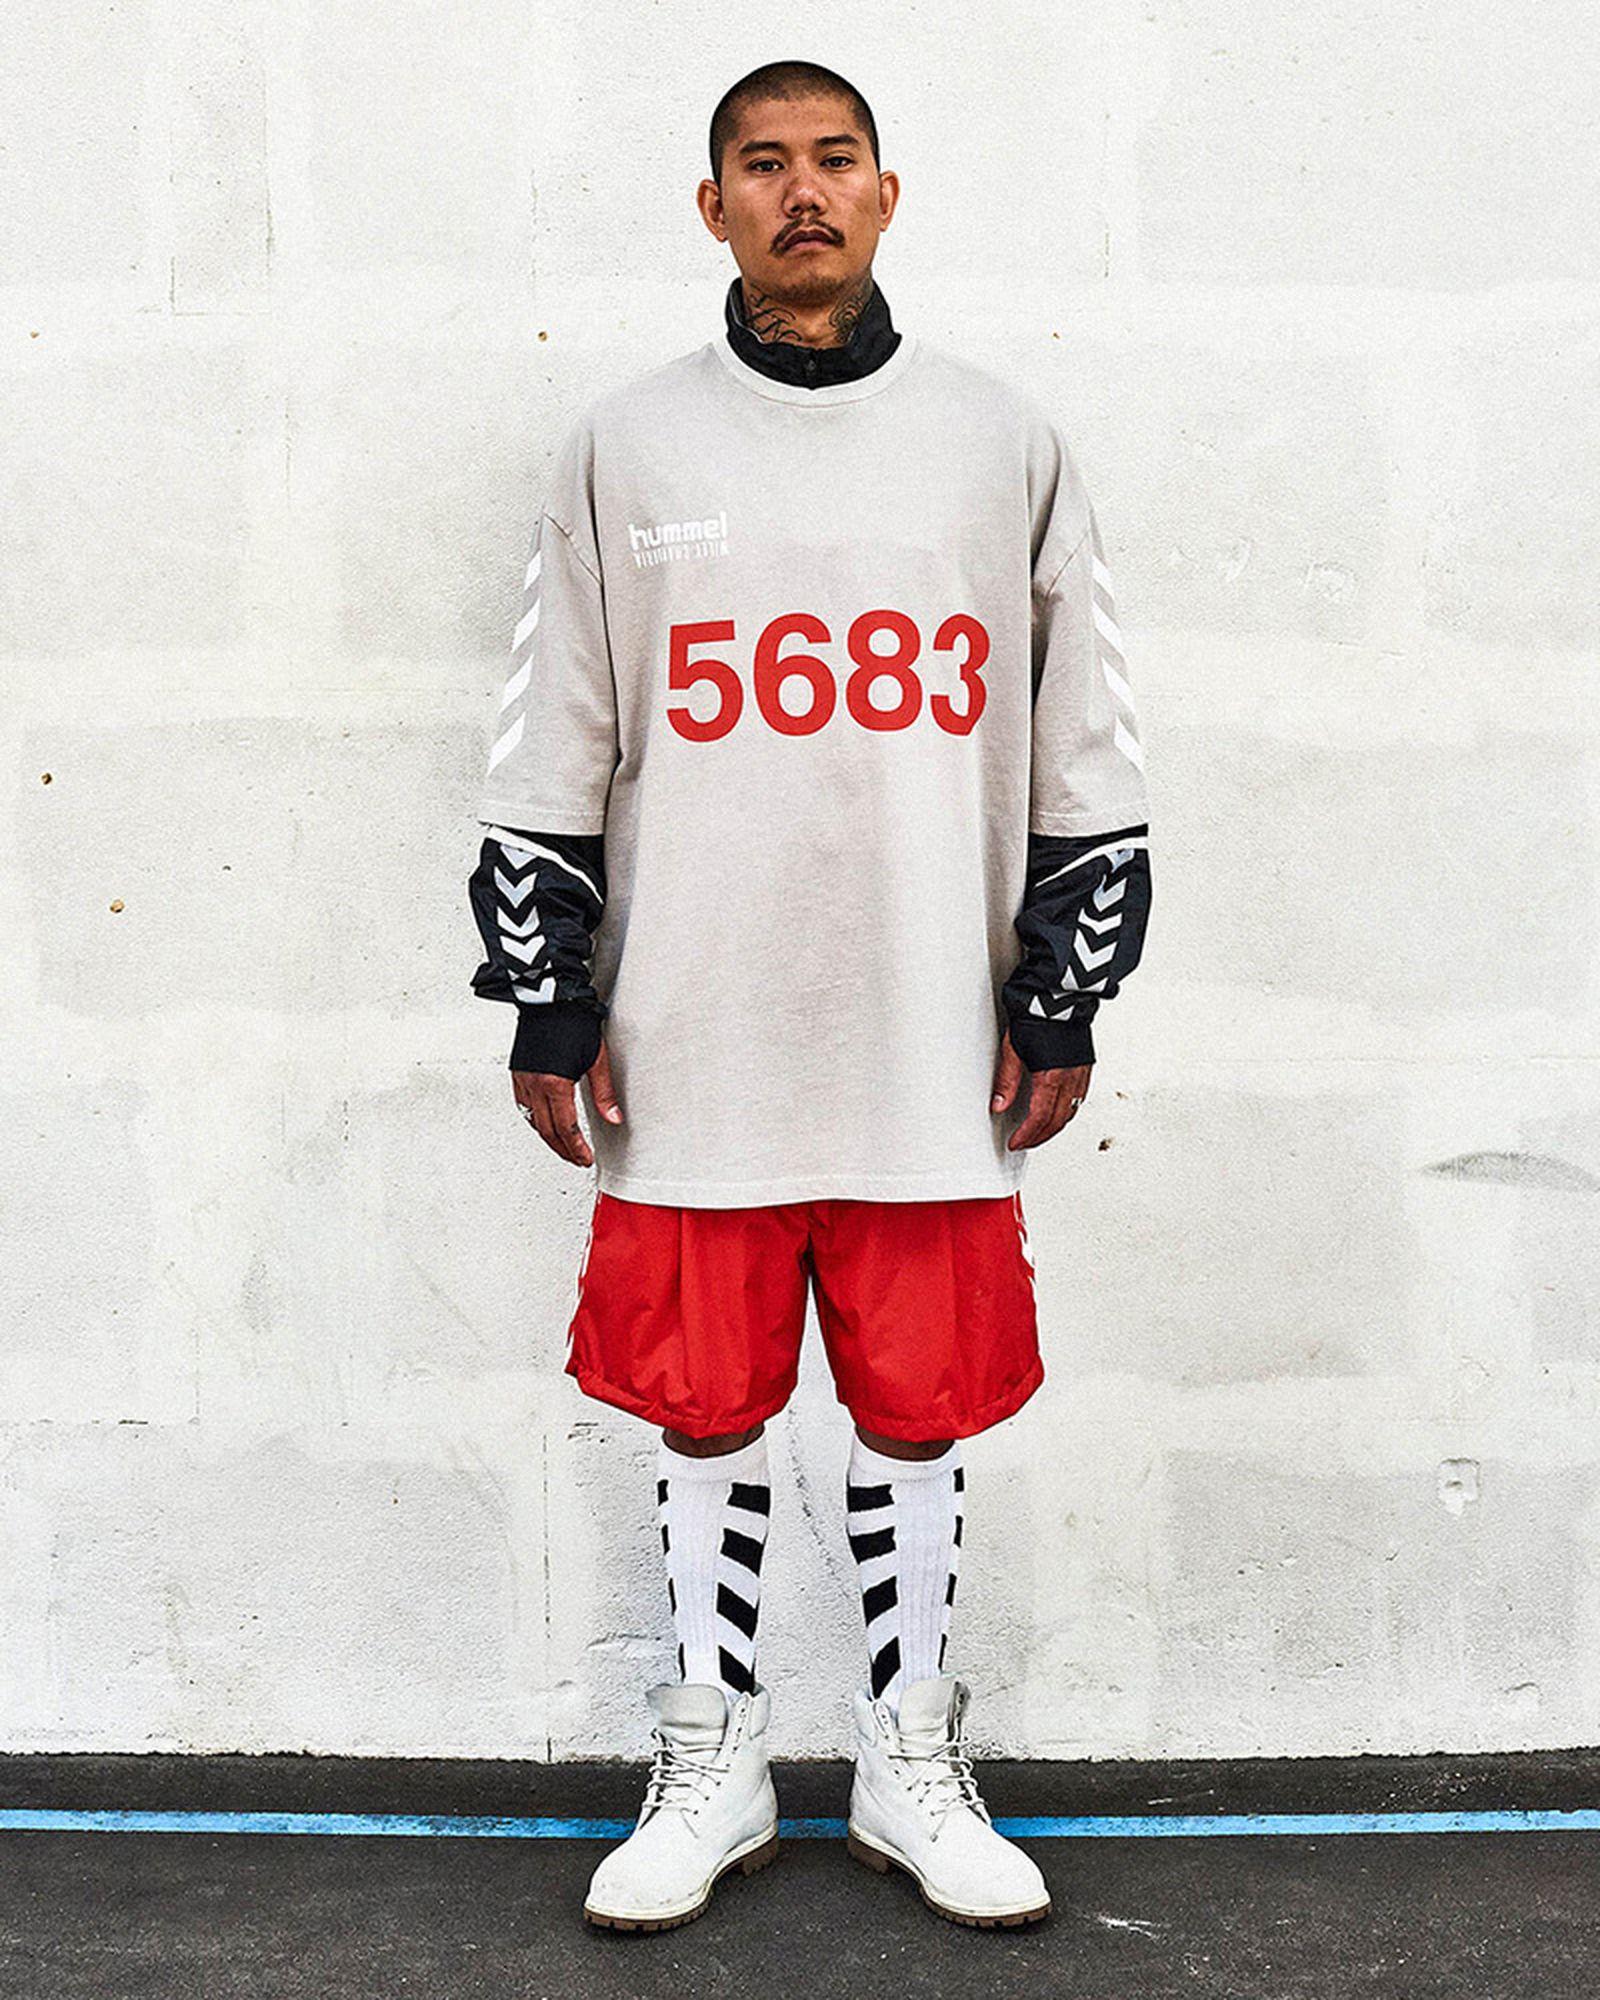 best sportswear brands world right now 2 Adidas HOKA Nike